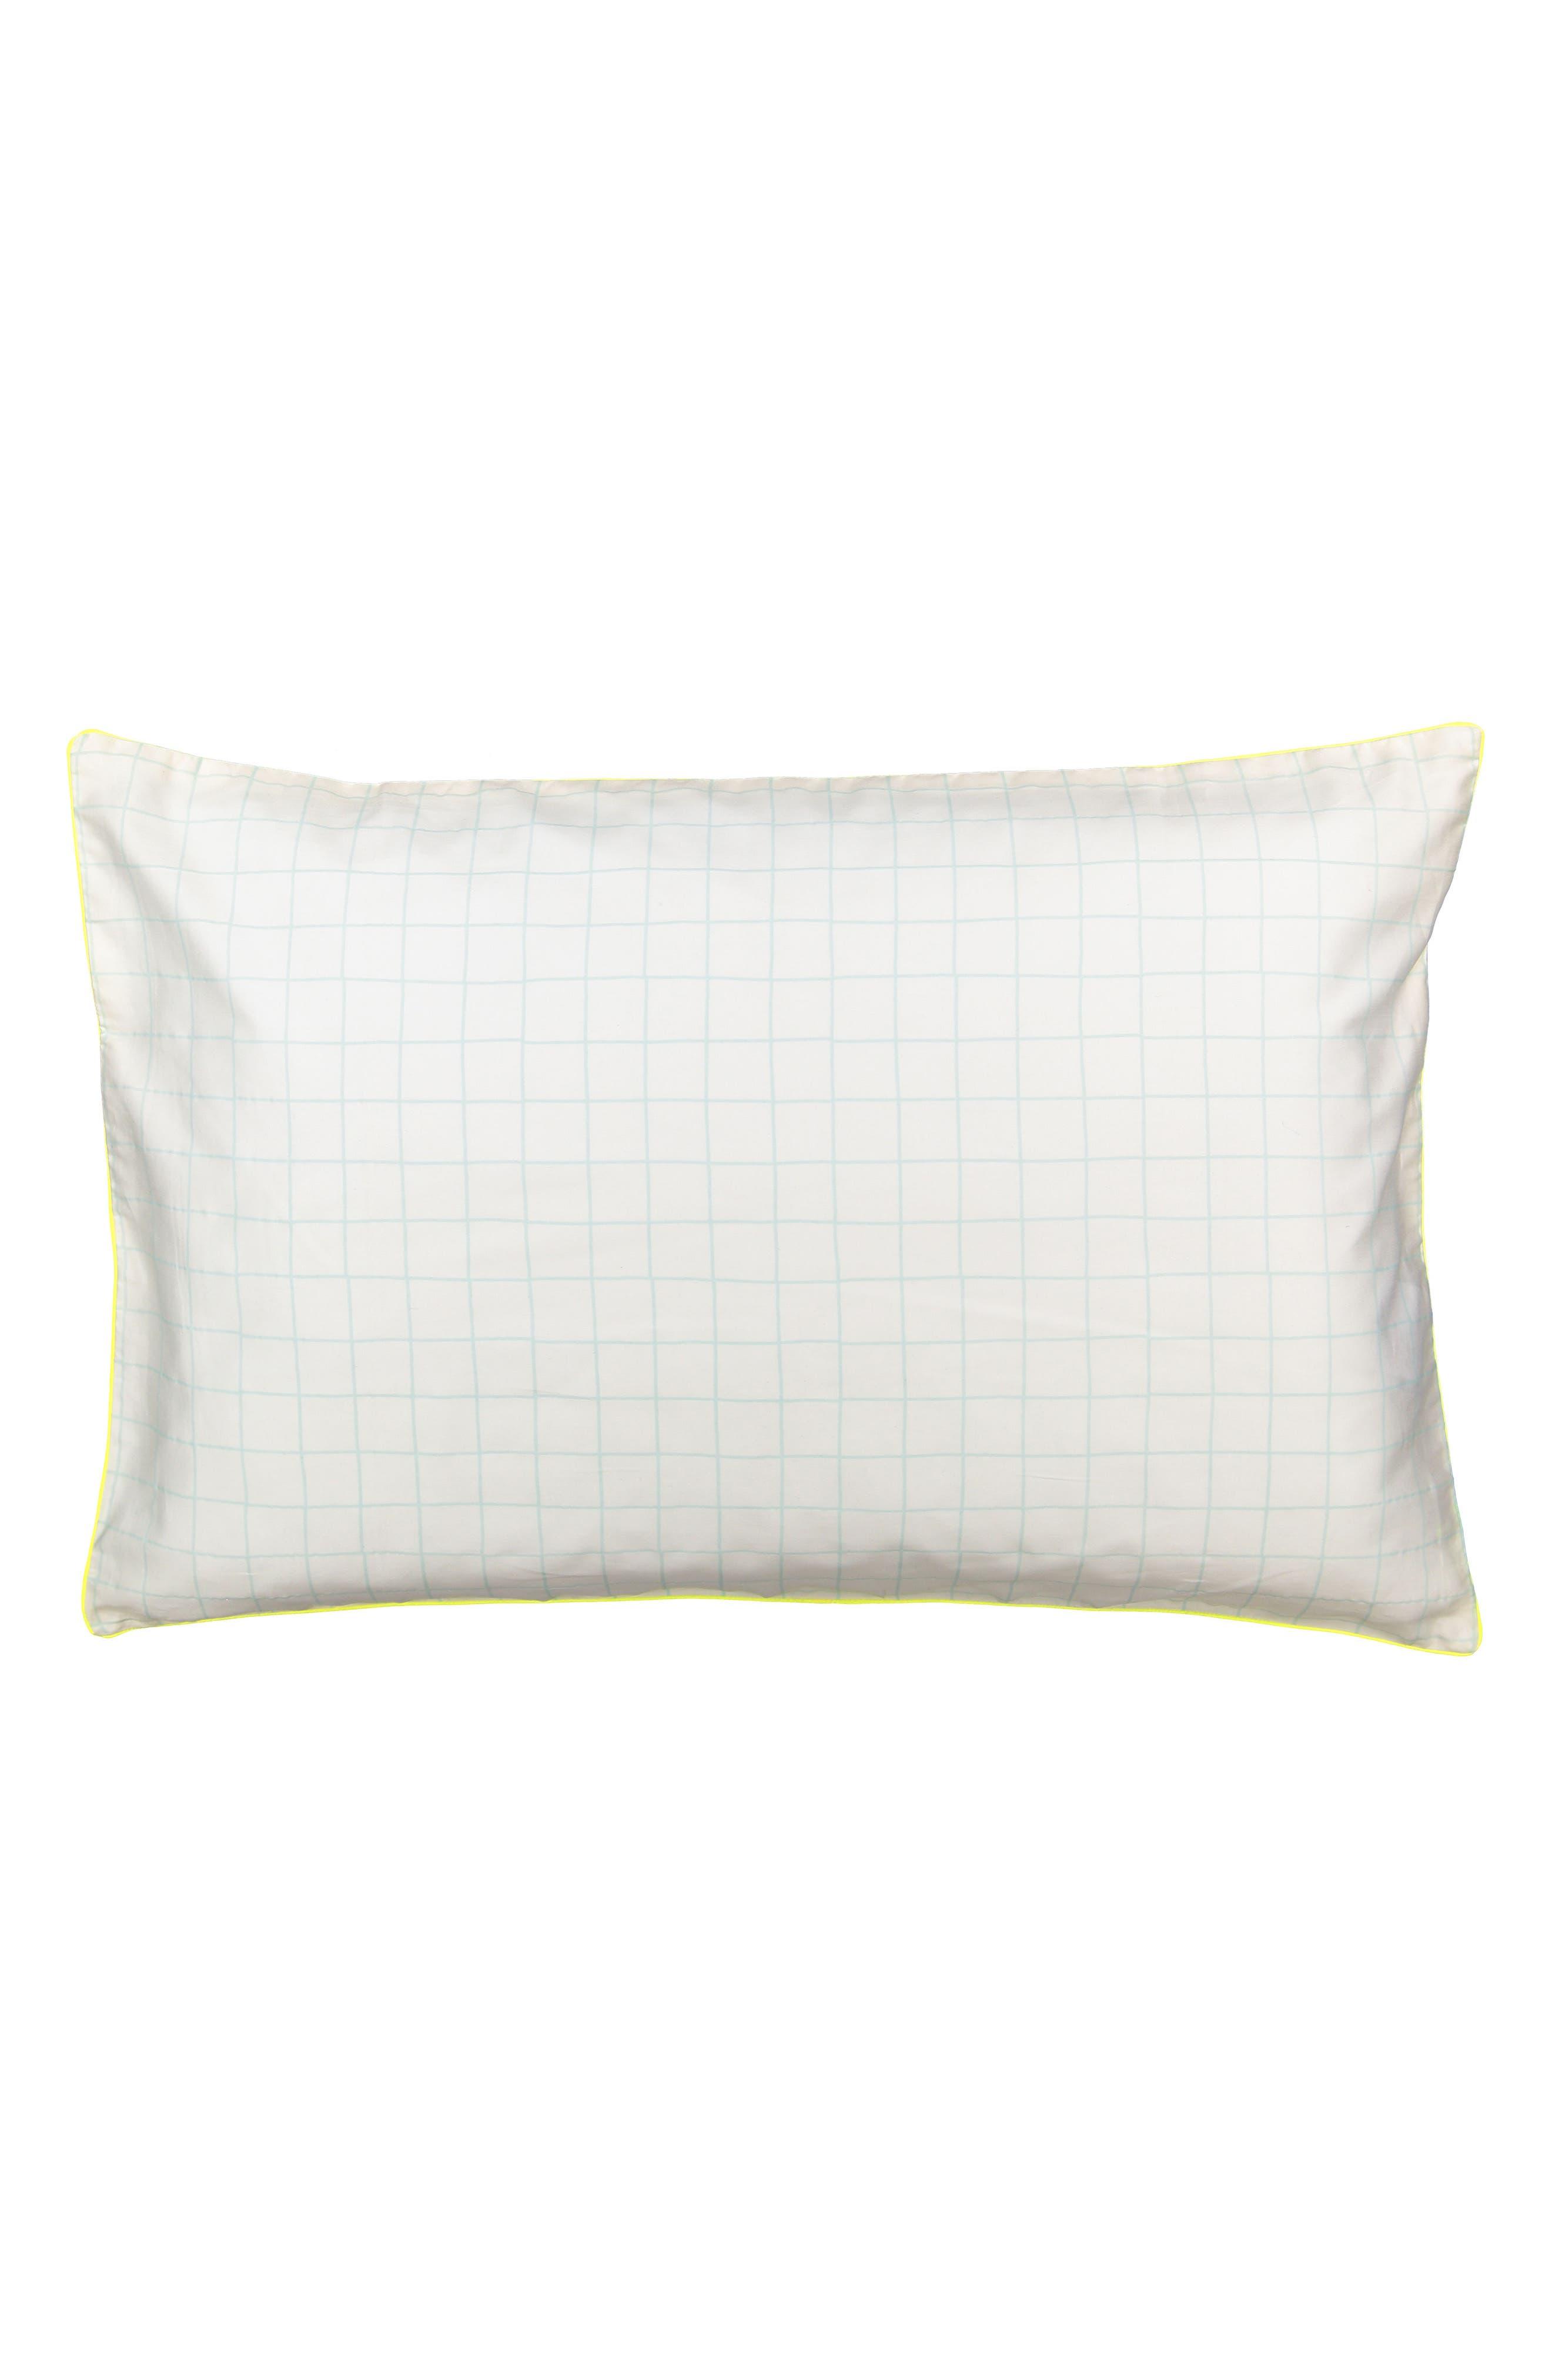 Twin Sheet & Pillowcase Set,                             Alternate thumbnail 2, color,                             MINT